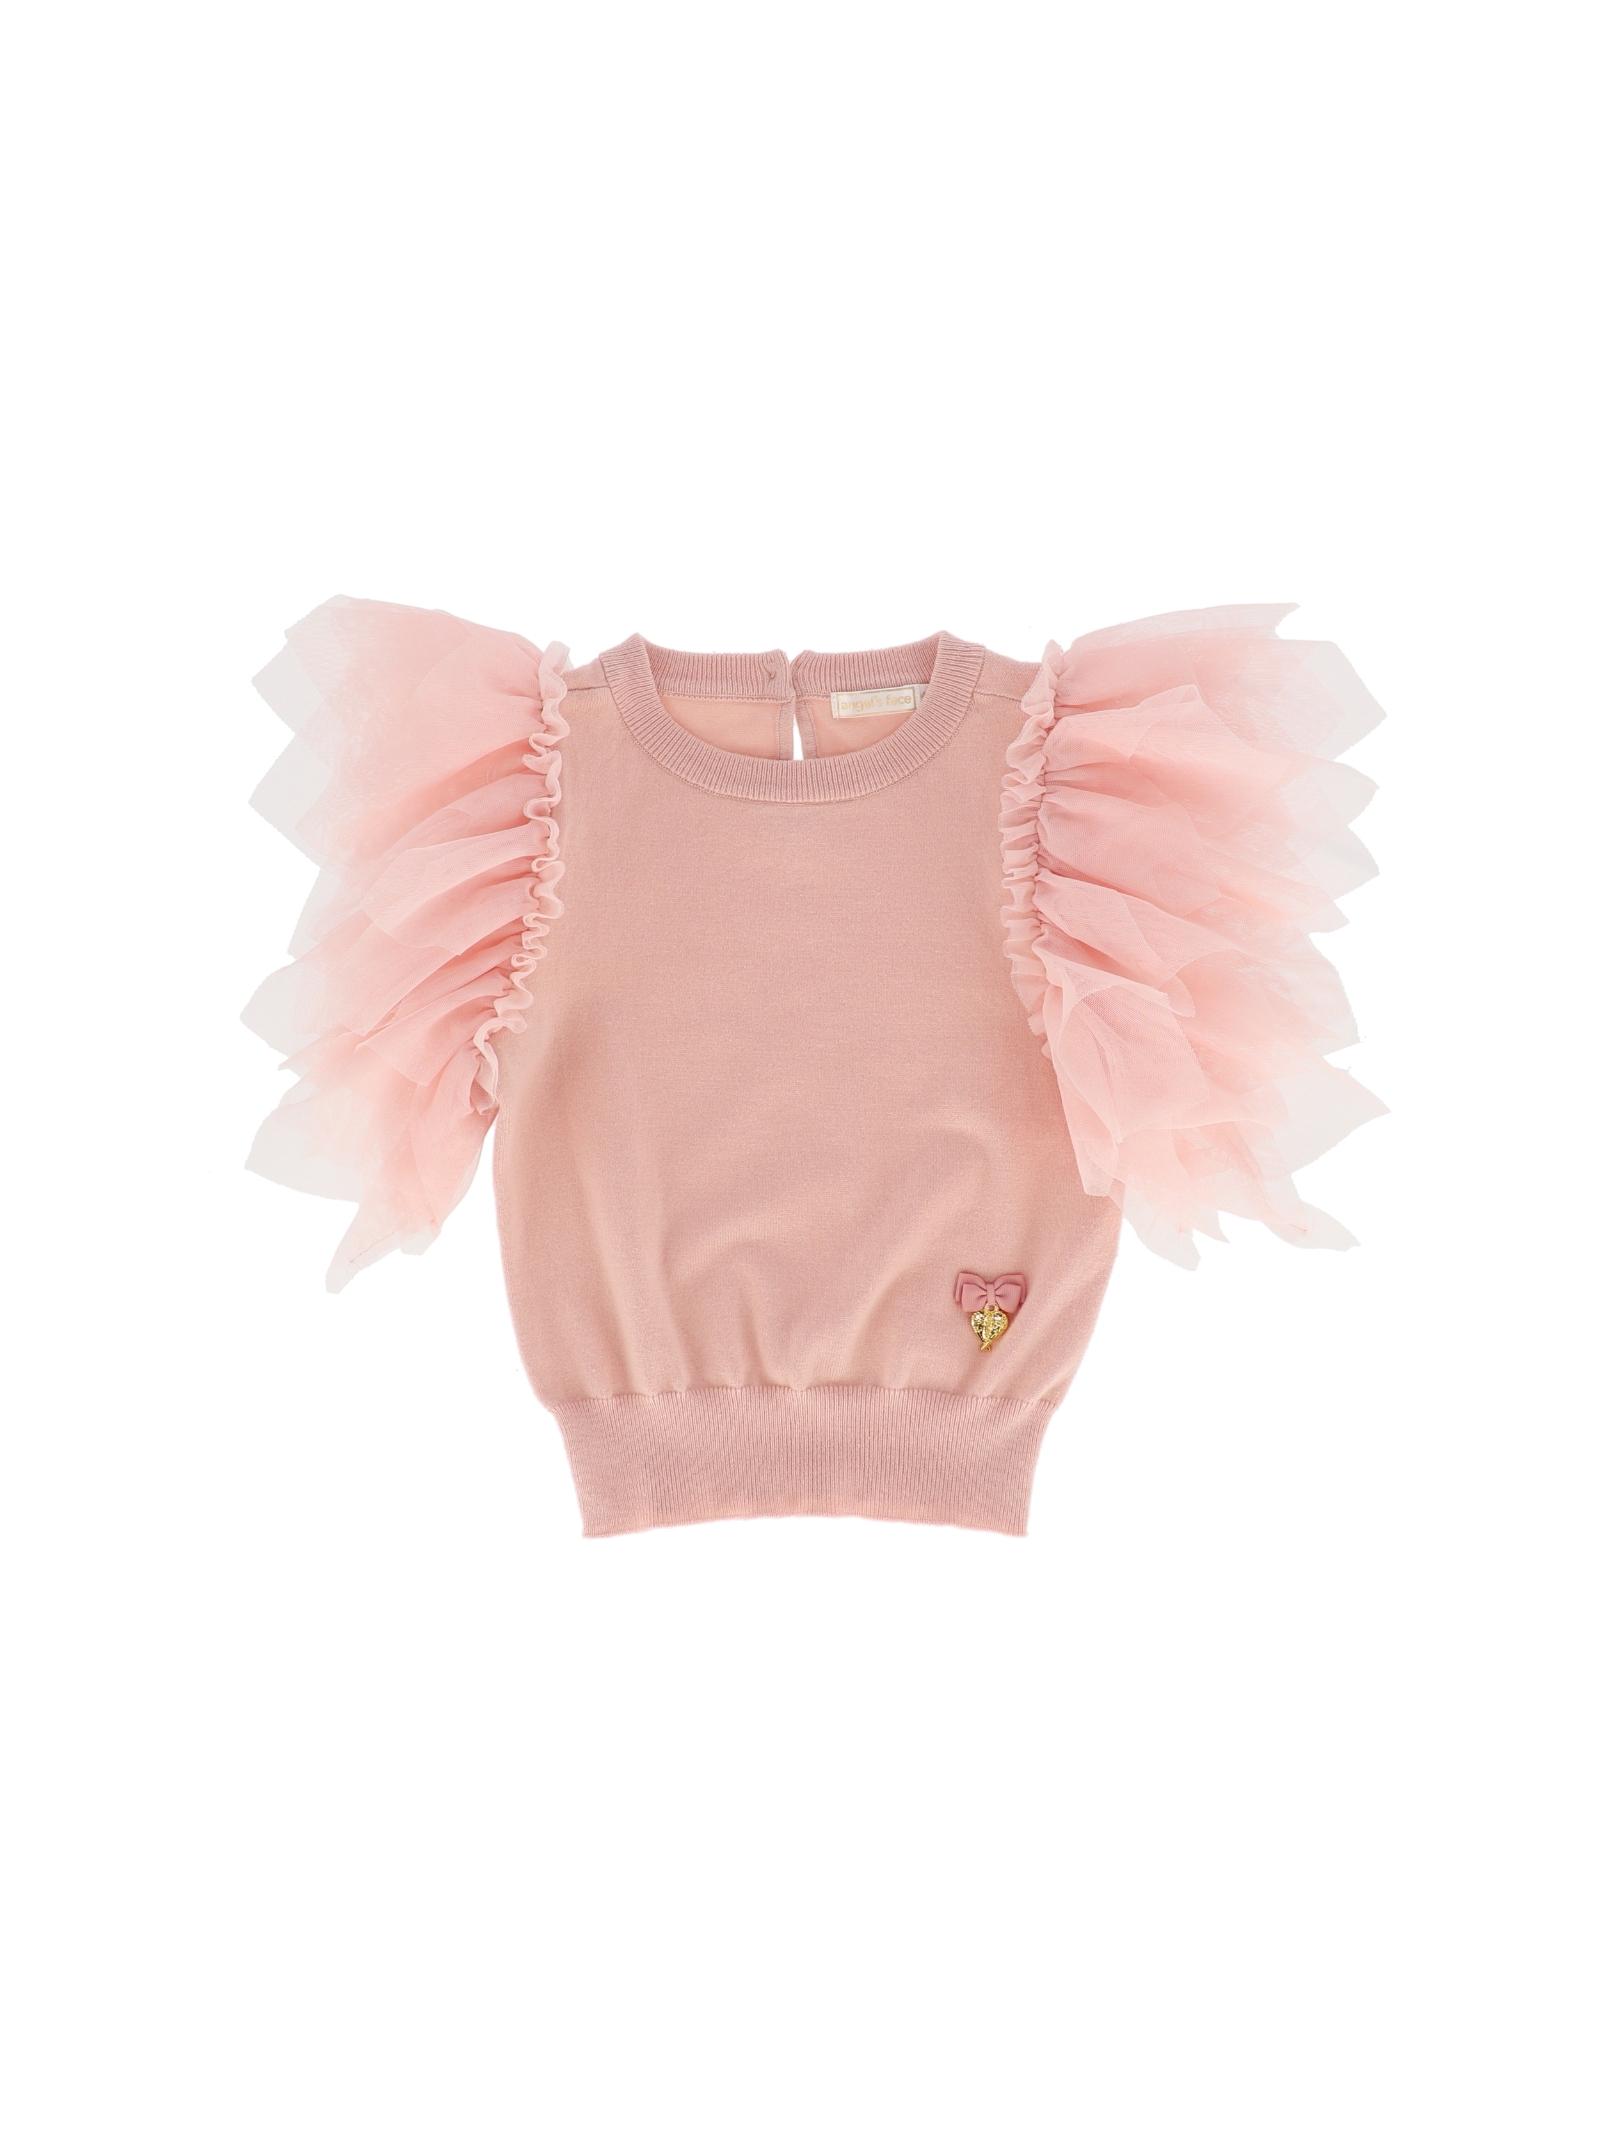 Nakita Blush Girl Sweater ANGEL'S FACE |  | NAKITABLUSH